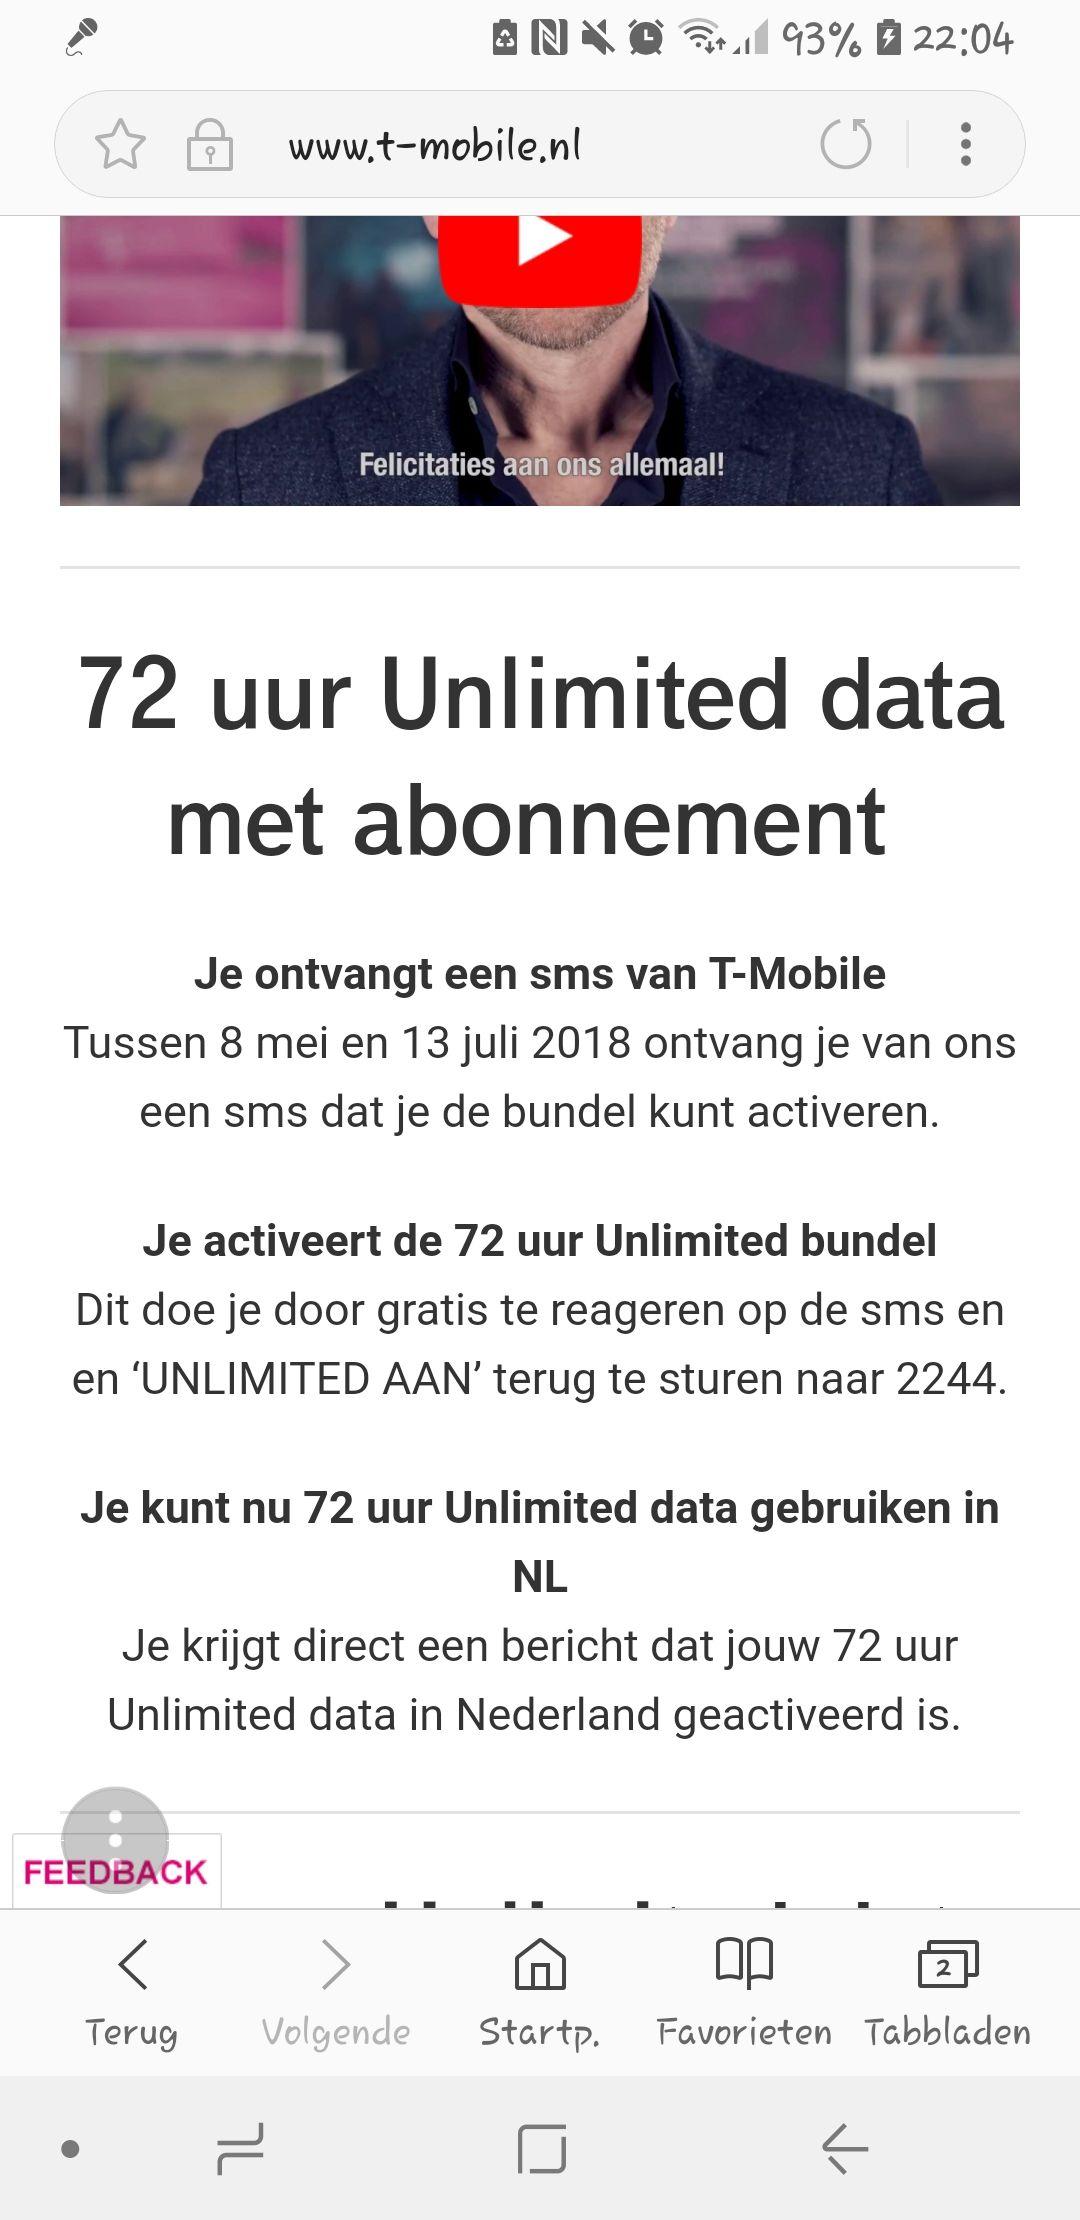 72 uur unlimited data van t mobile vanaf 8 mei t/m 13 juli!